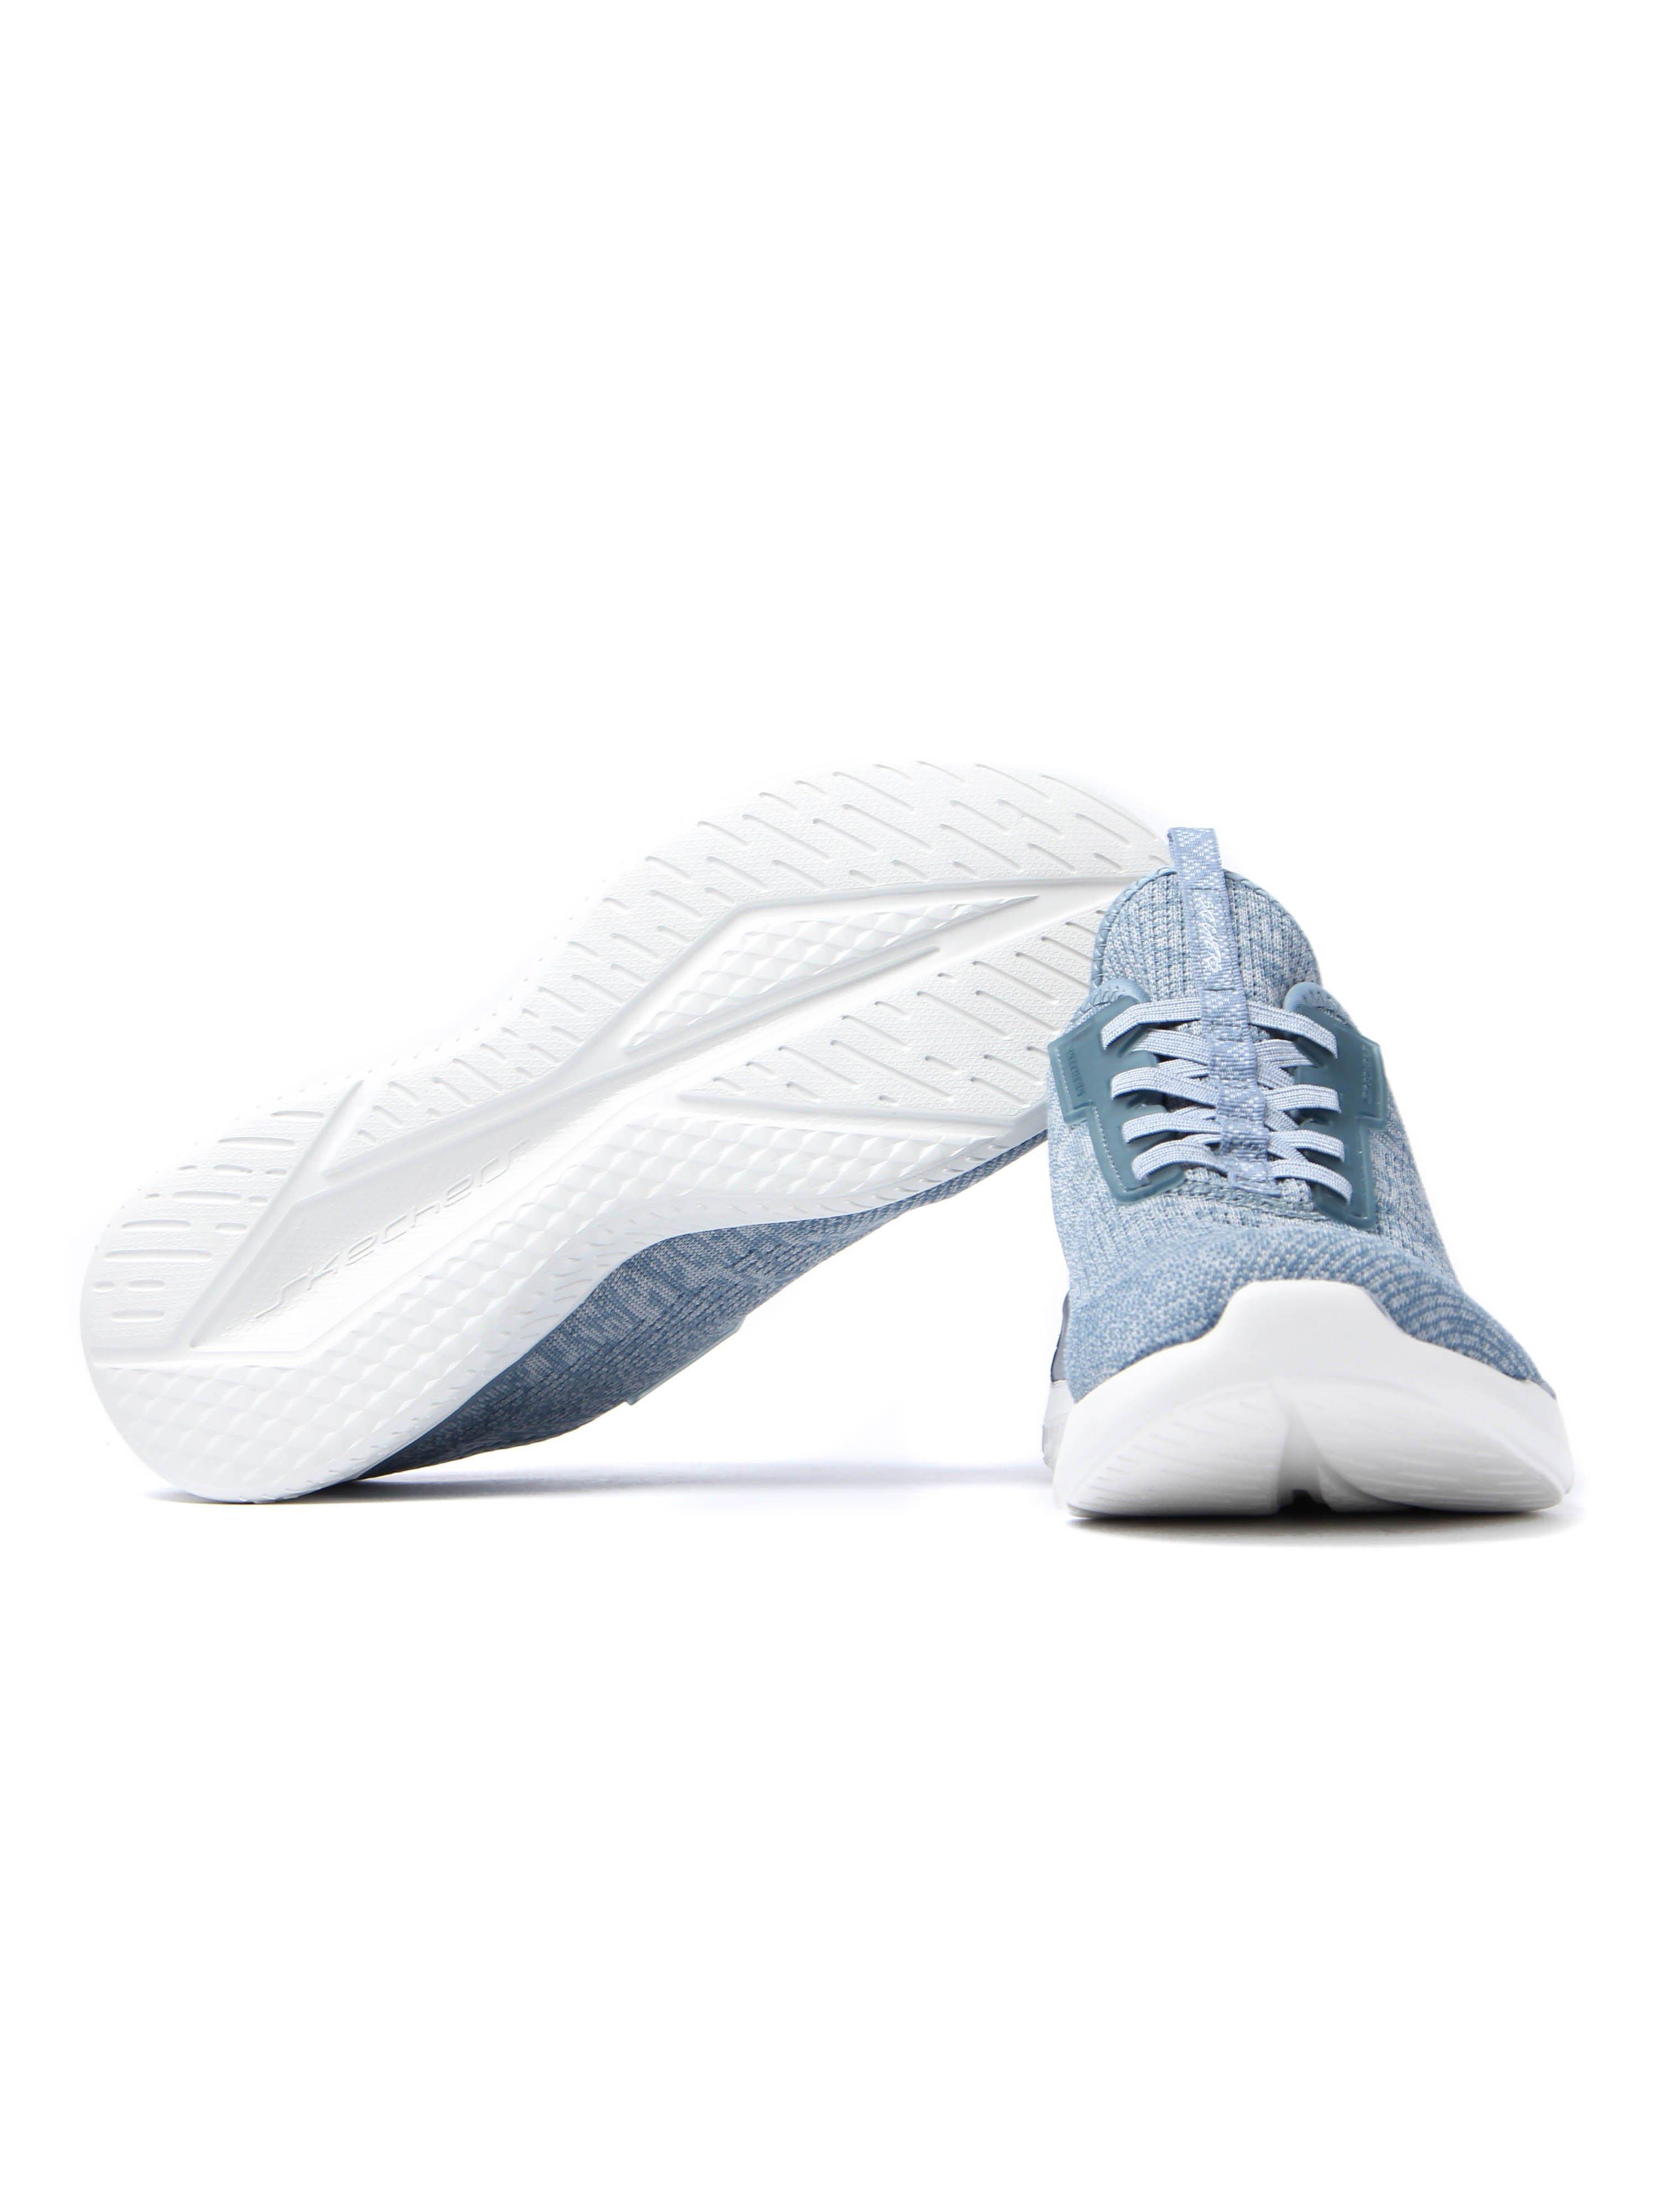 Skechers Women's Matrixx Trainers - Light Blue